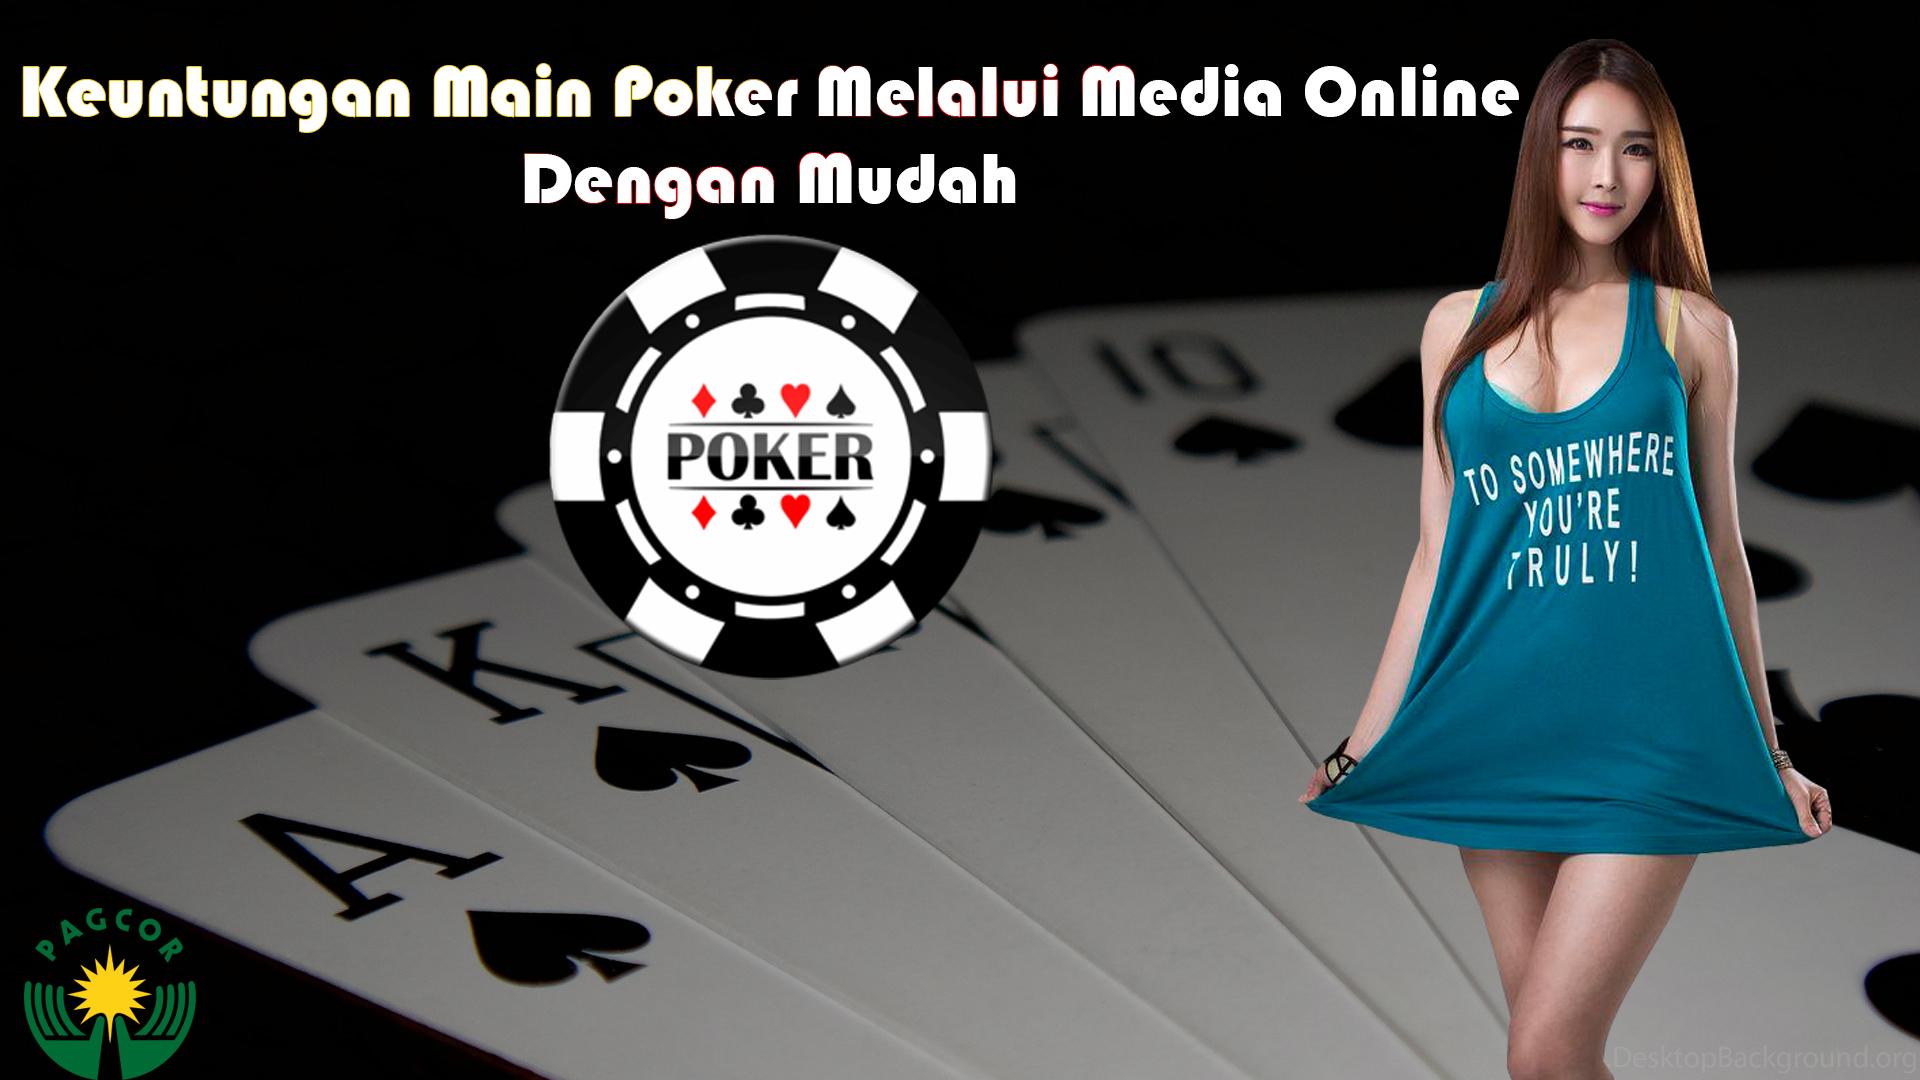 Keuntungan Main Poker Melalui Media Online Dengan Mudah